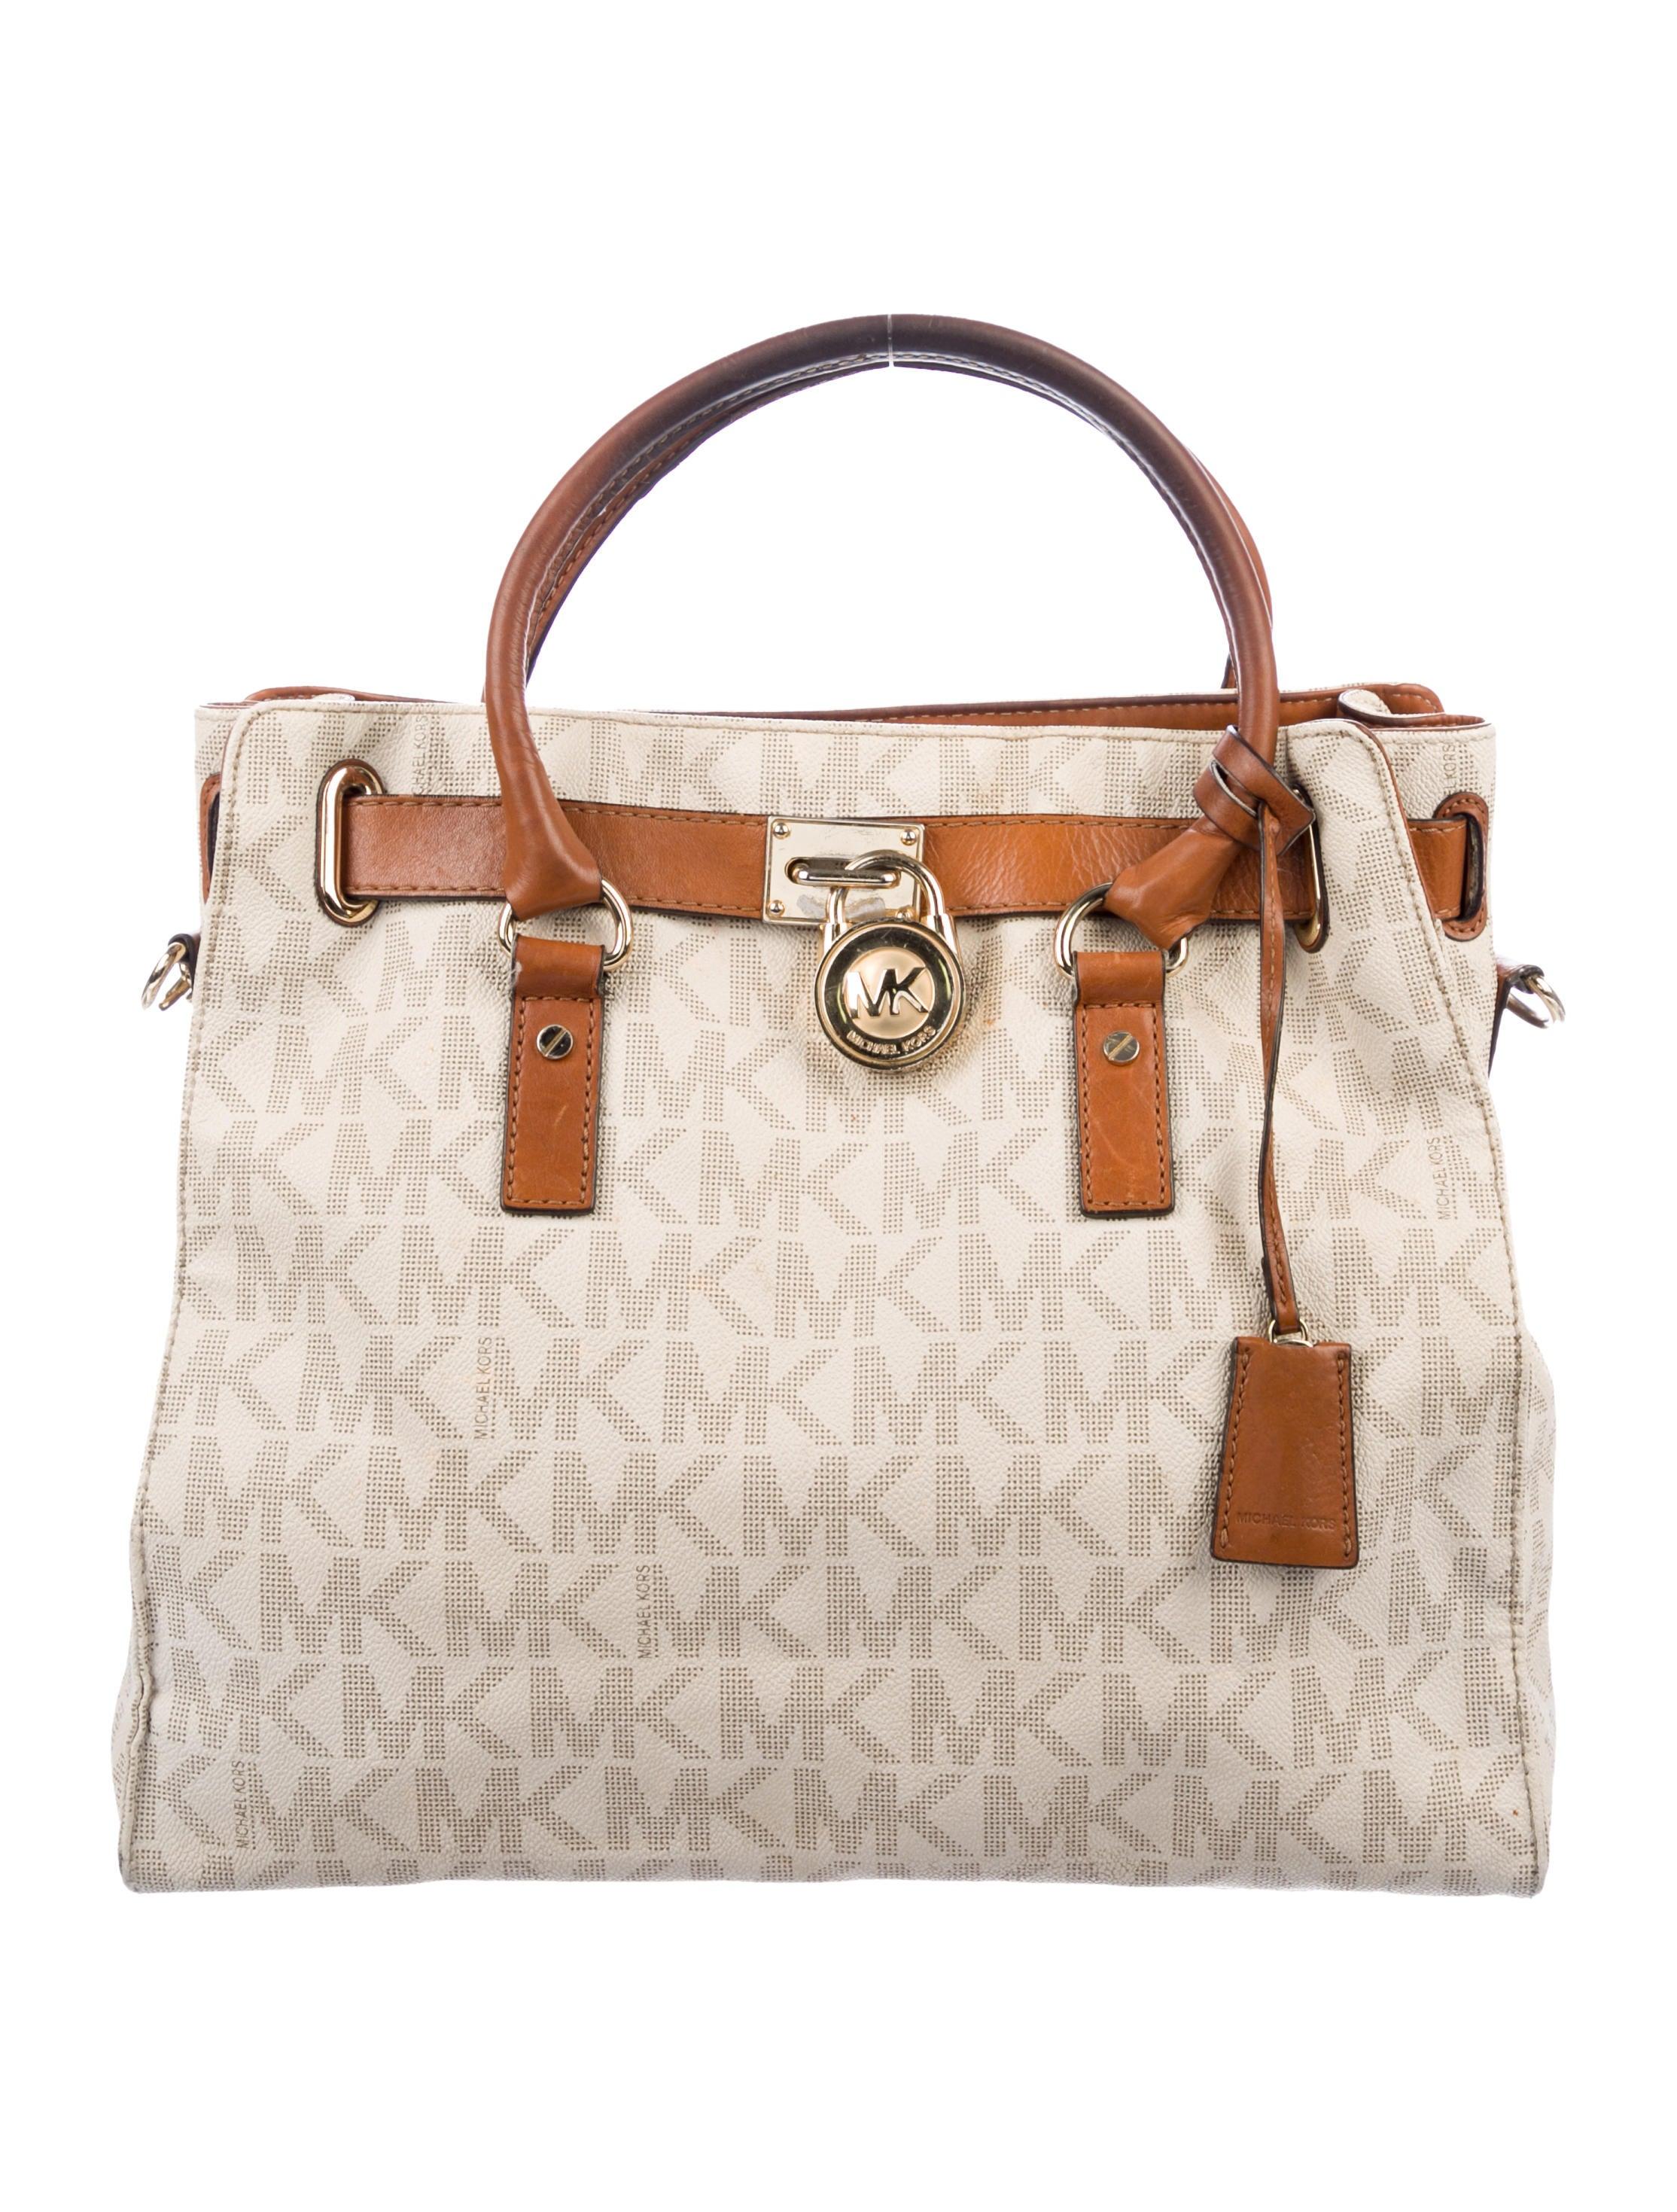 22c8c0045a6505 Michael Michael Kors Large Hamilton Satchel - Handbags - WM531047 ...